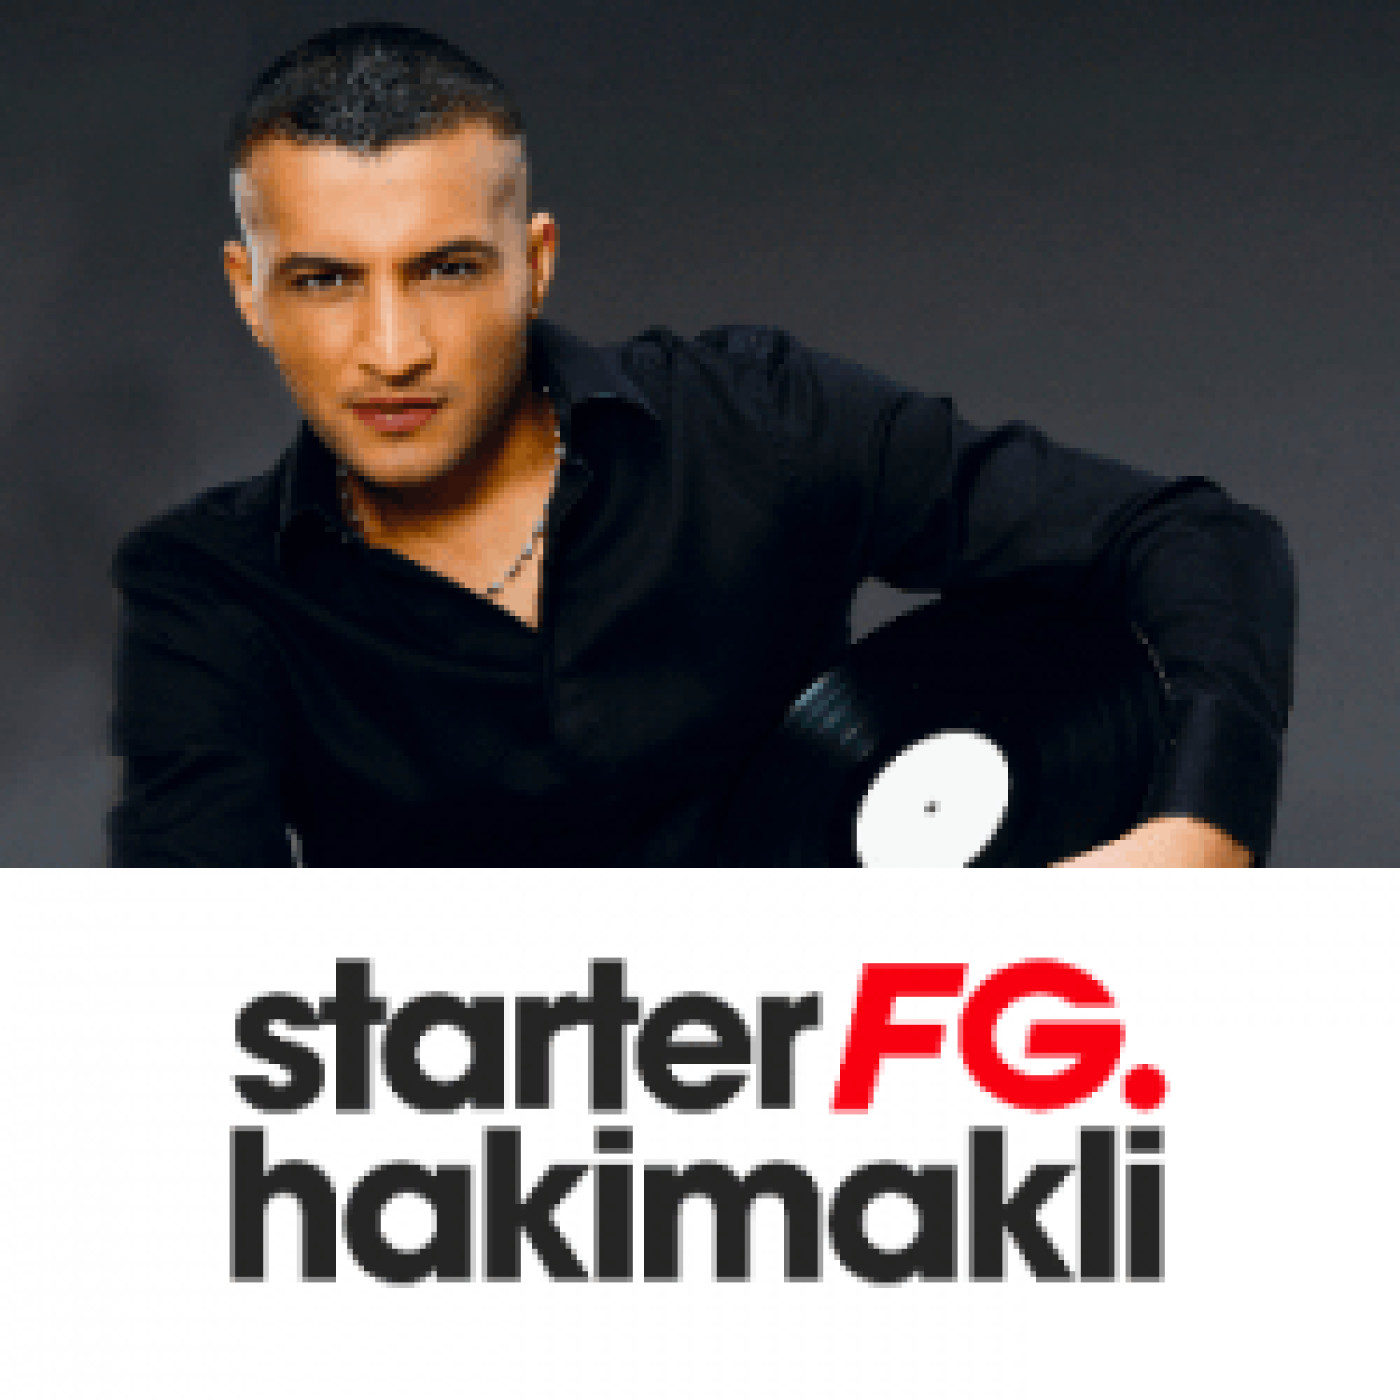 STARTER FG BY HAKIMAKLI JEUDI 19 NOVEMBRE 2020